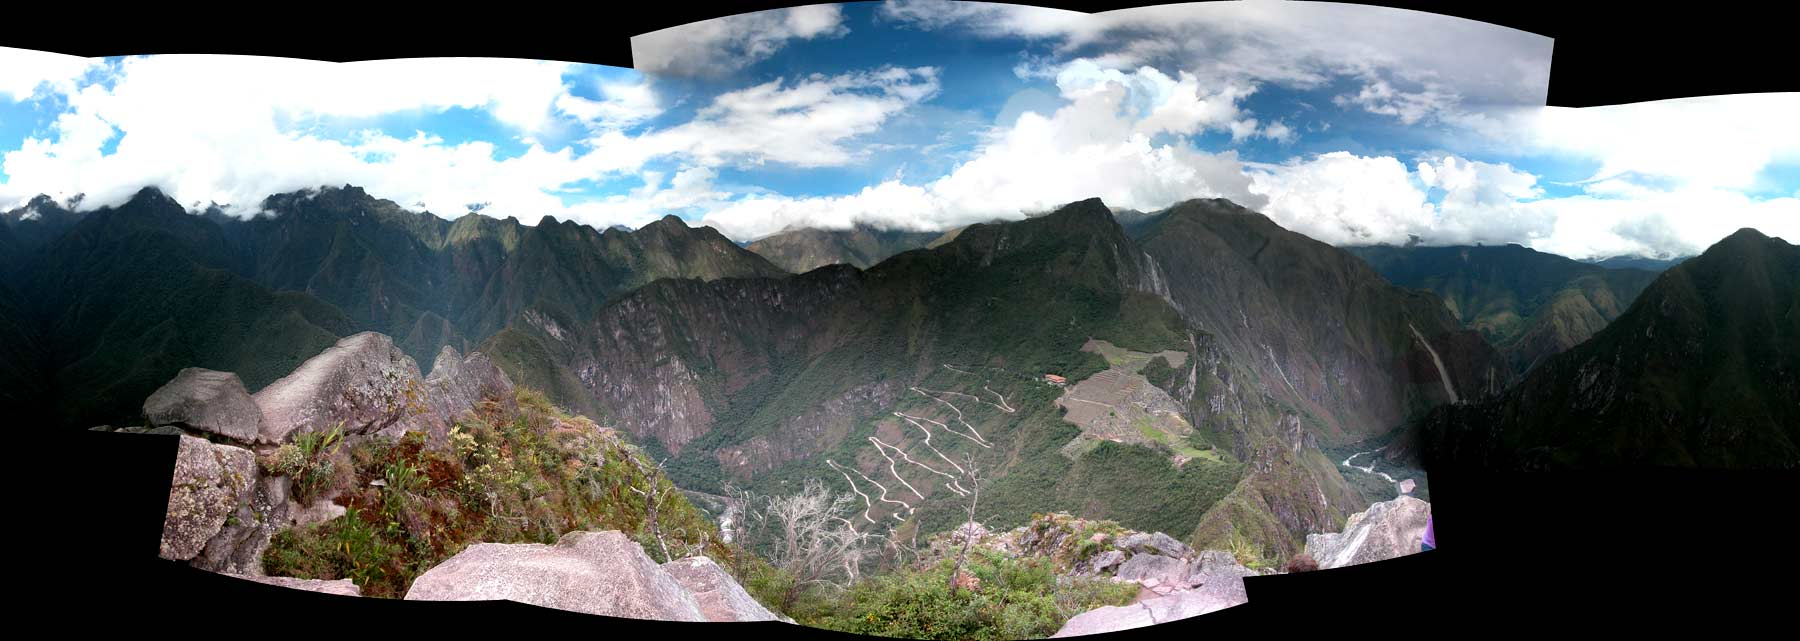 Panoramic of Machu Picchu taken from Huayna Picchu